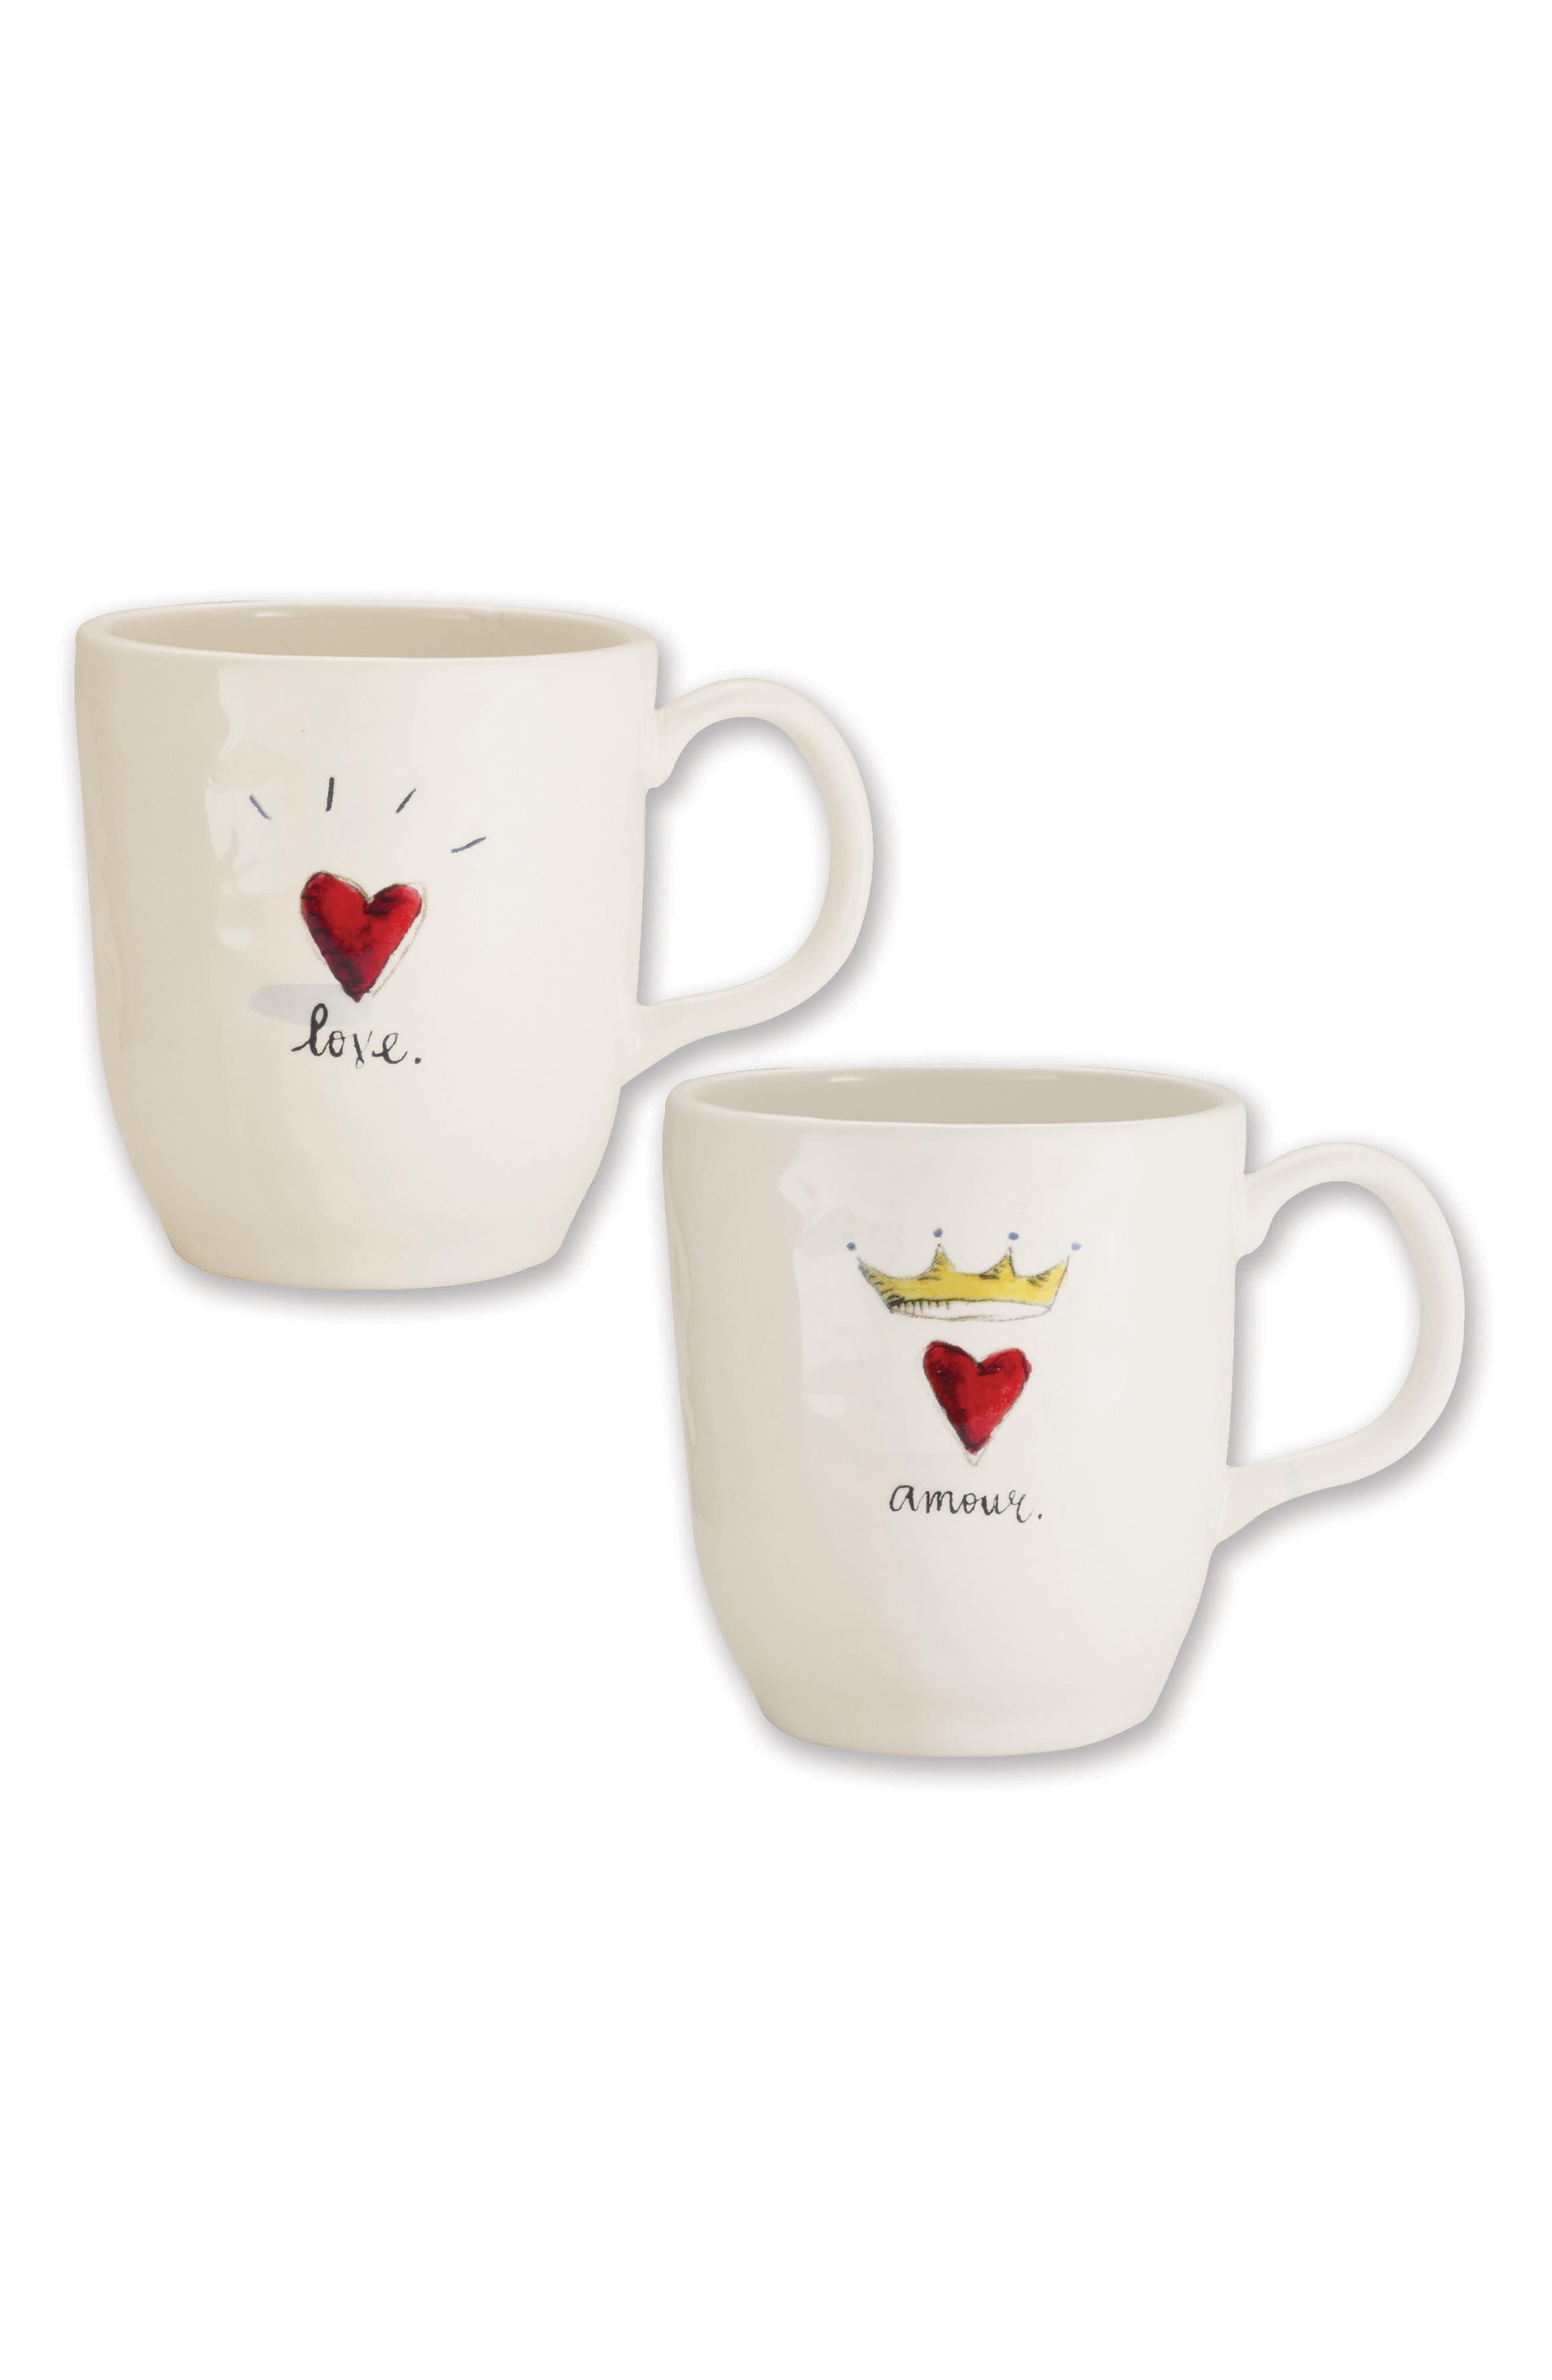 Main Image - Rae Dunn Love & Amour Set of 2 Ceramic Mugs